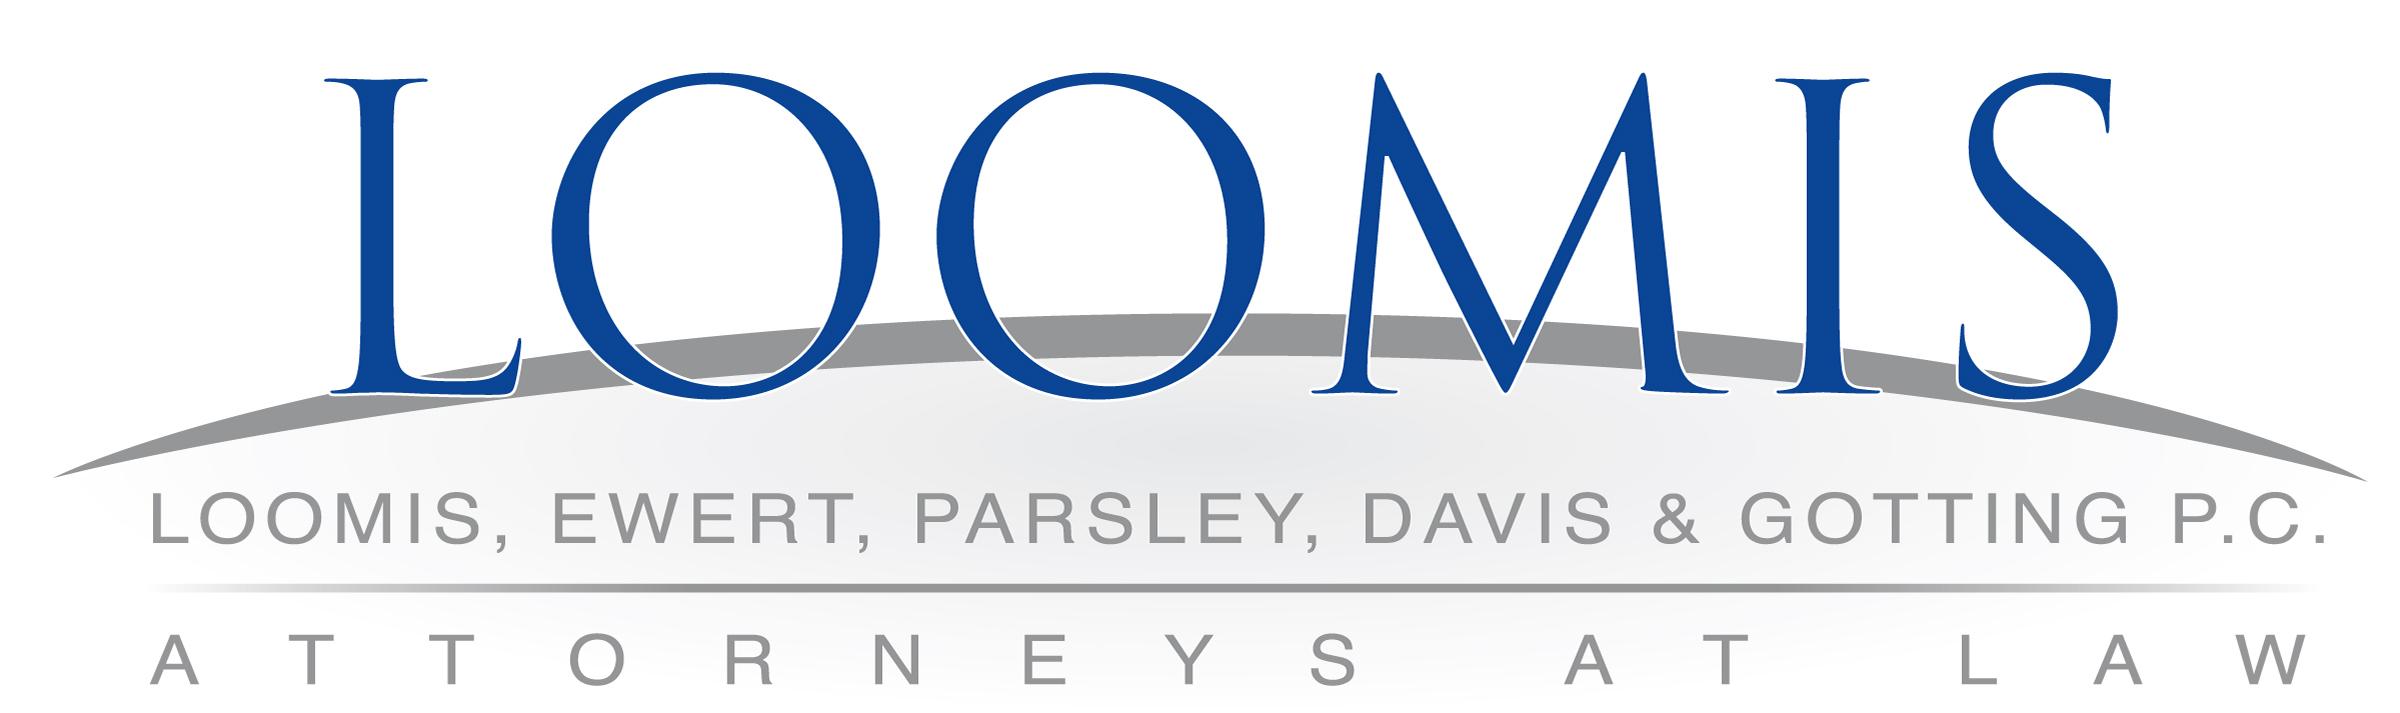 Loomis, Ewert, Parsley, Davis & Gotting, P.C. Logo